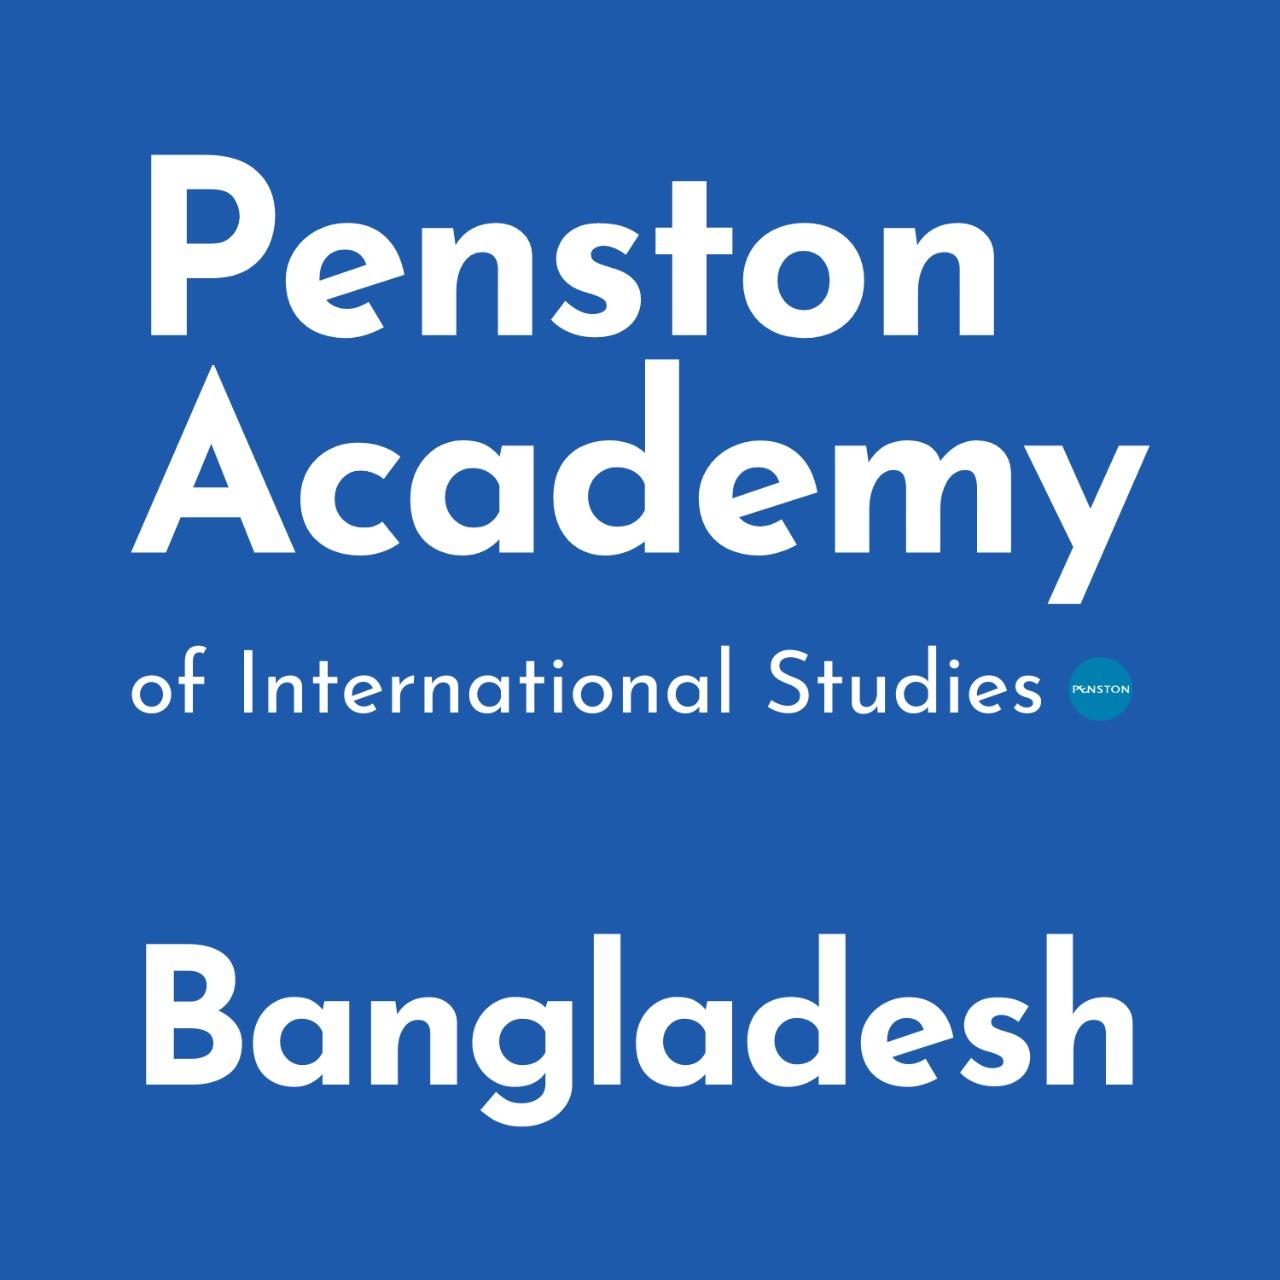 Penston Academy